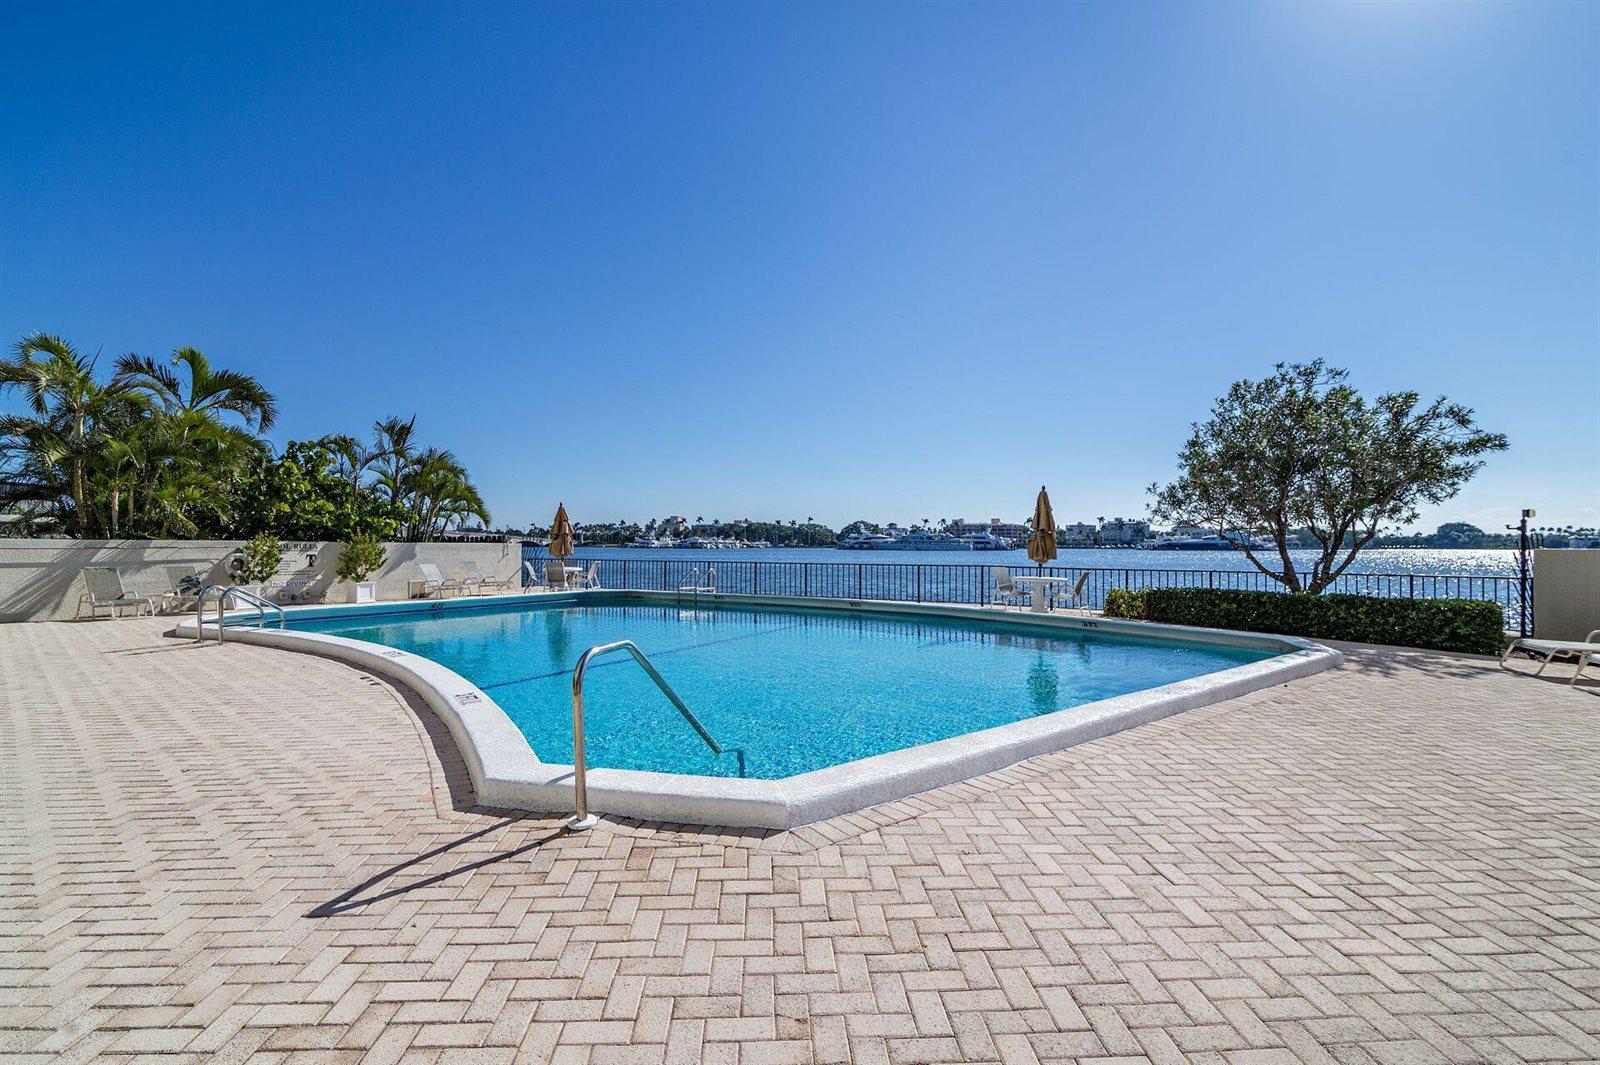 1200 South Flagler, #902, West Palm Beach, FL 33401